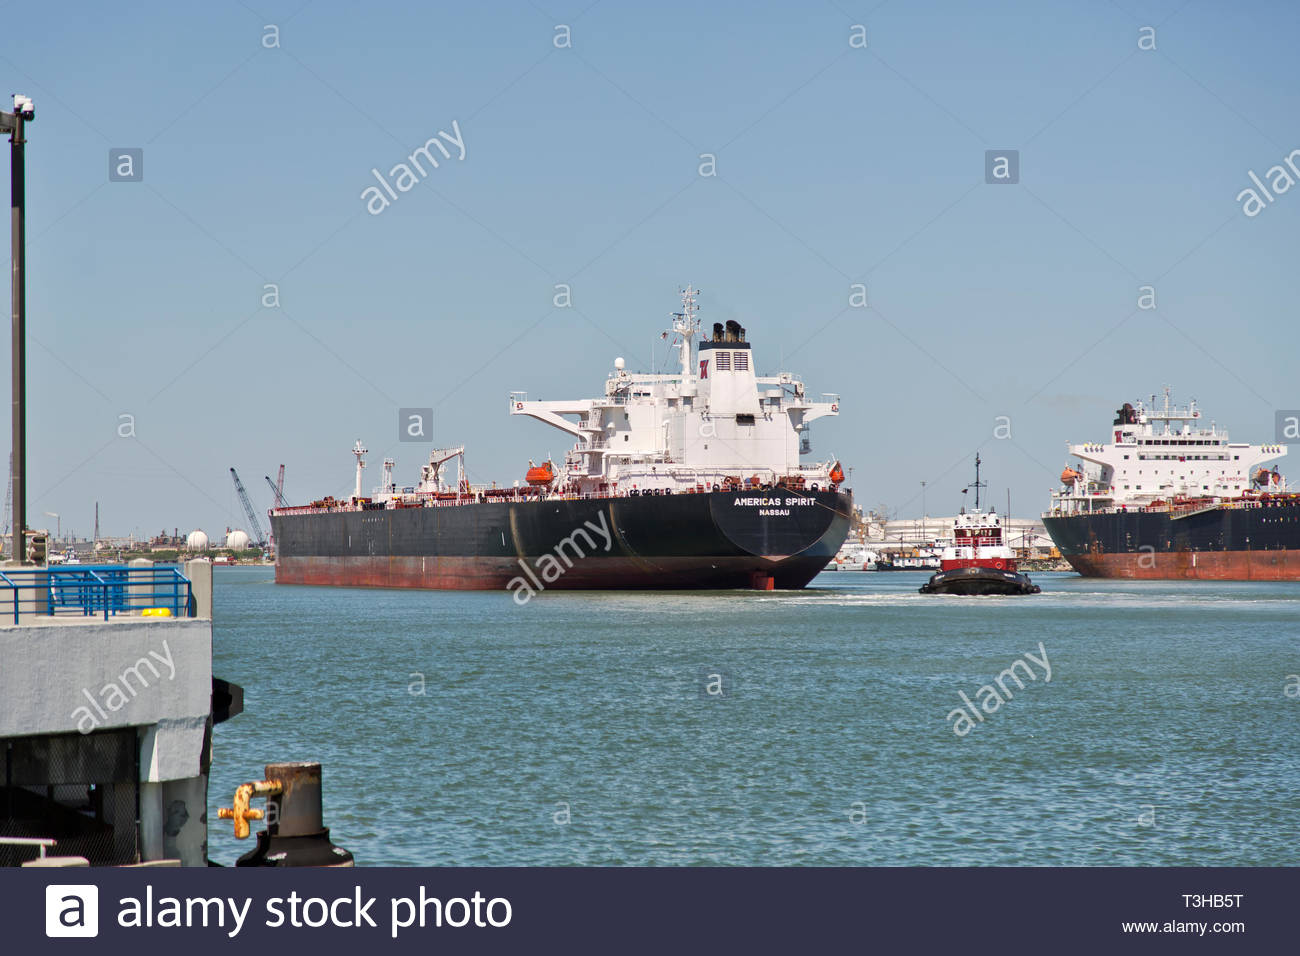 Empty Crude Oil Carrier entering Port Of Corpus Christi. Stock Photo